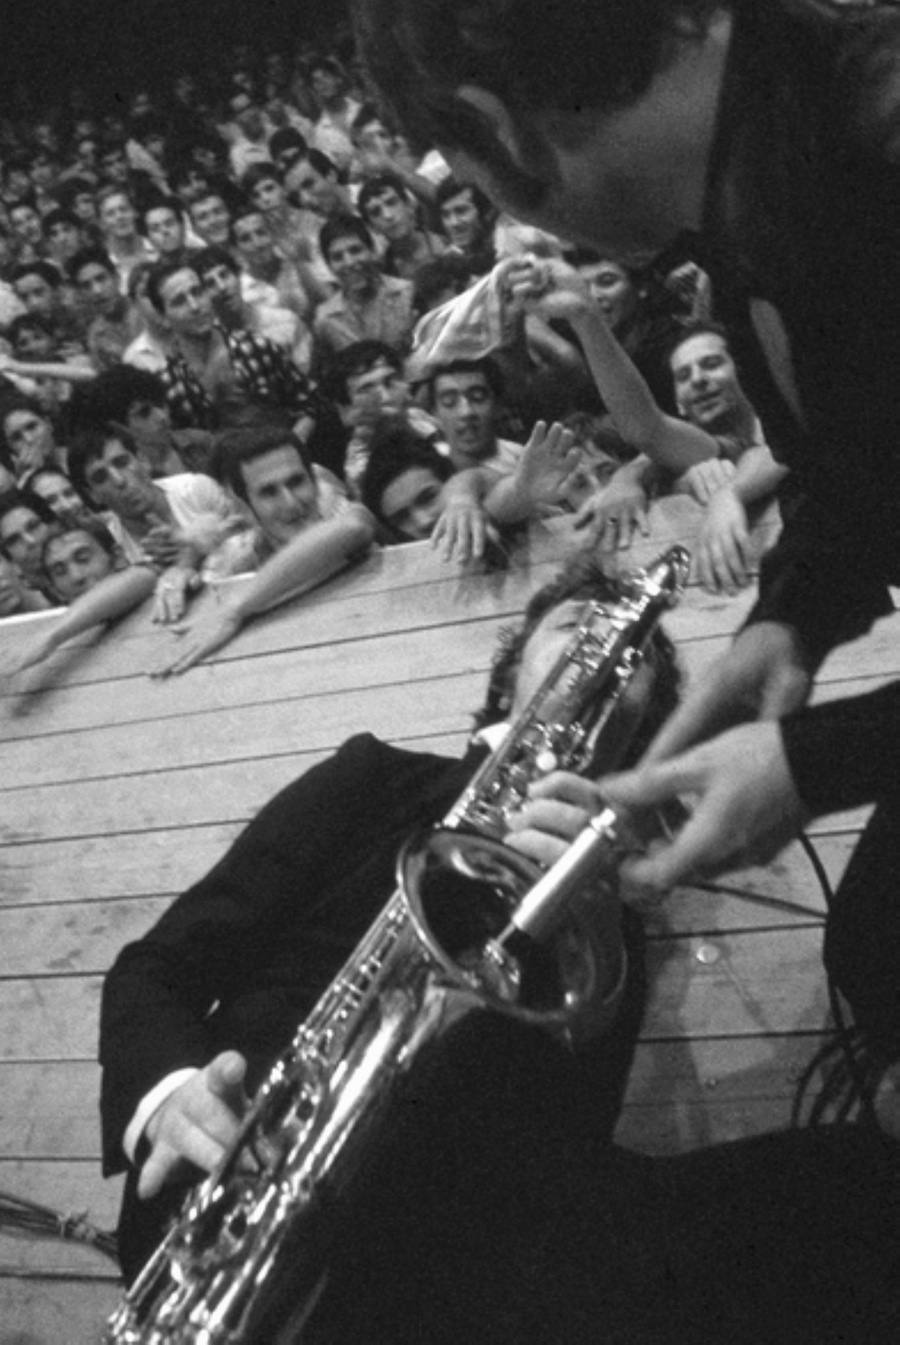 LES CONCERTS DE JOHNNY 'ROSARIO, ARGENTINE 1967' Captu114